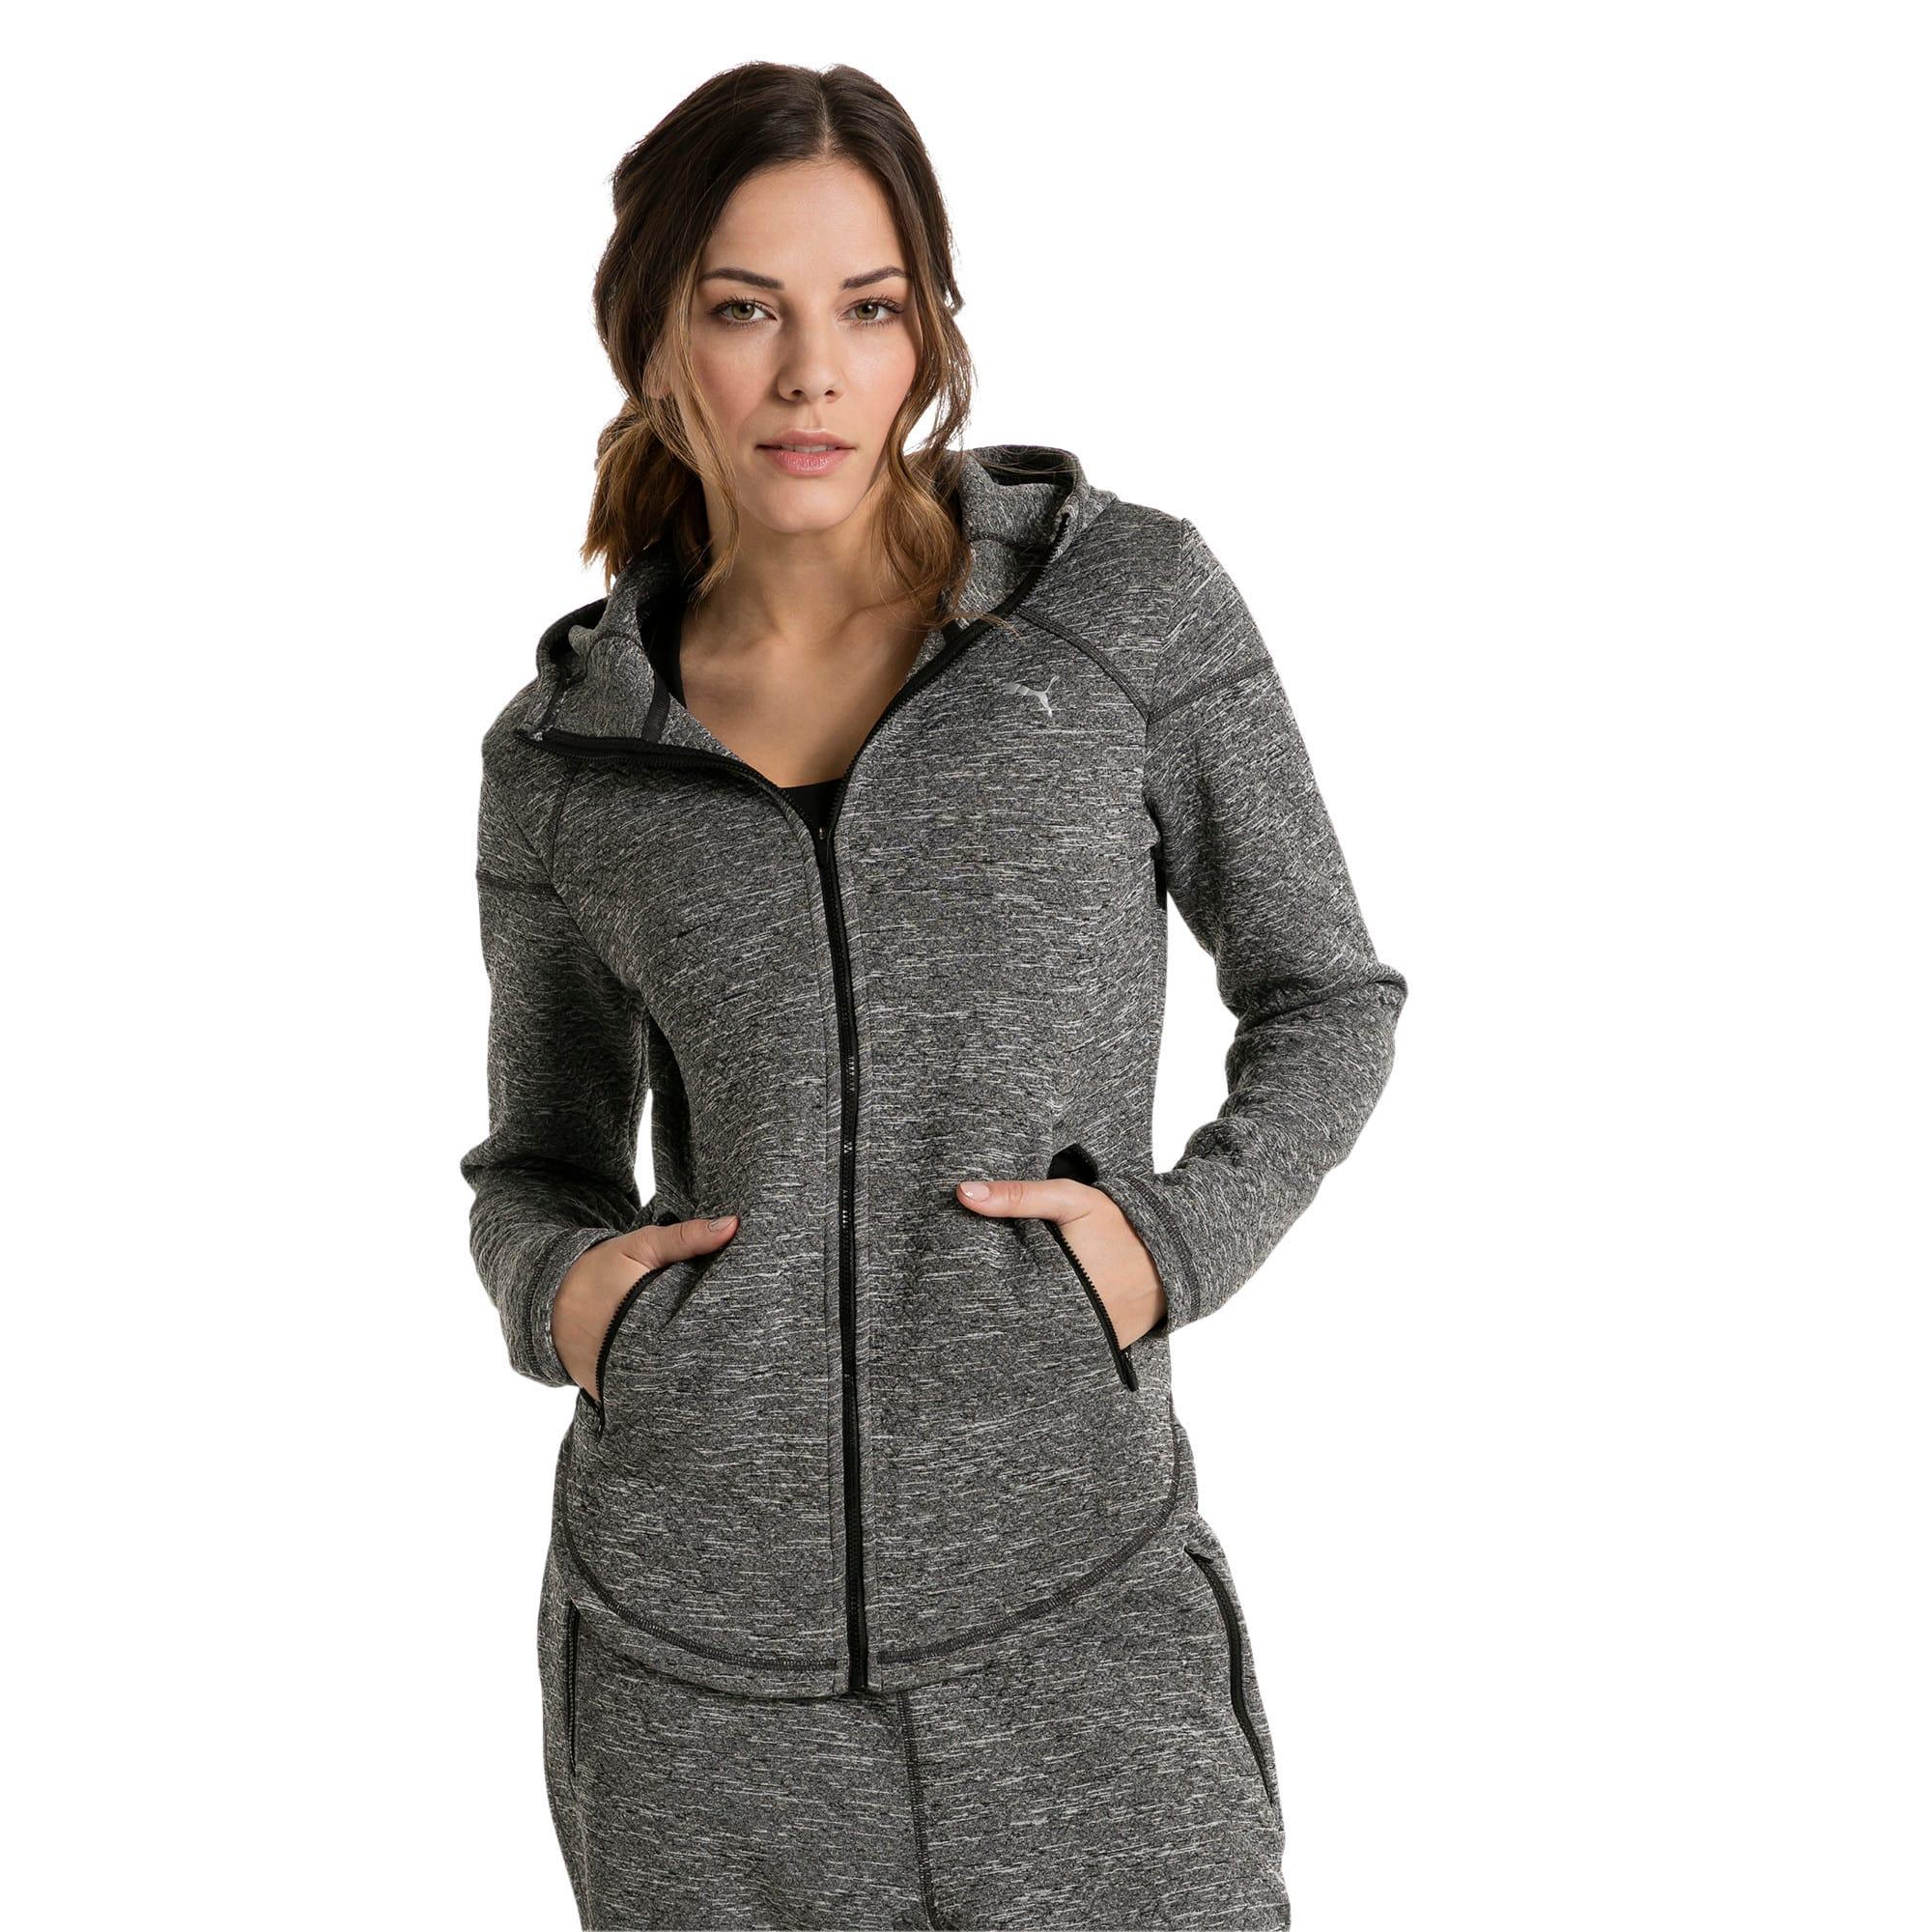 Thumbnail 1 of Active Training Women's Nocturnal Winterized Jacket, Dark Gray Heather, medium-IND